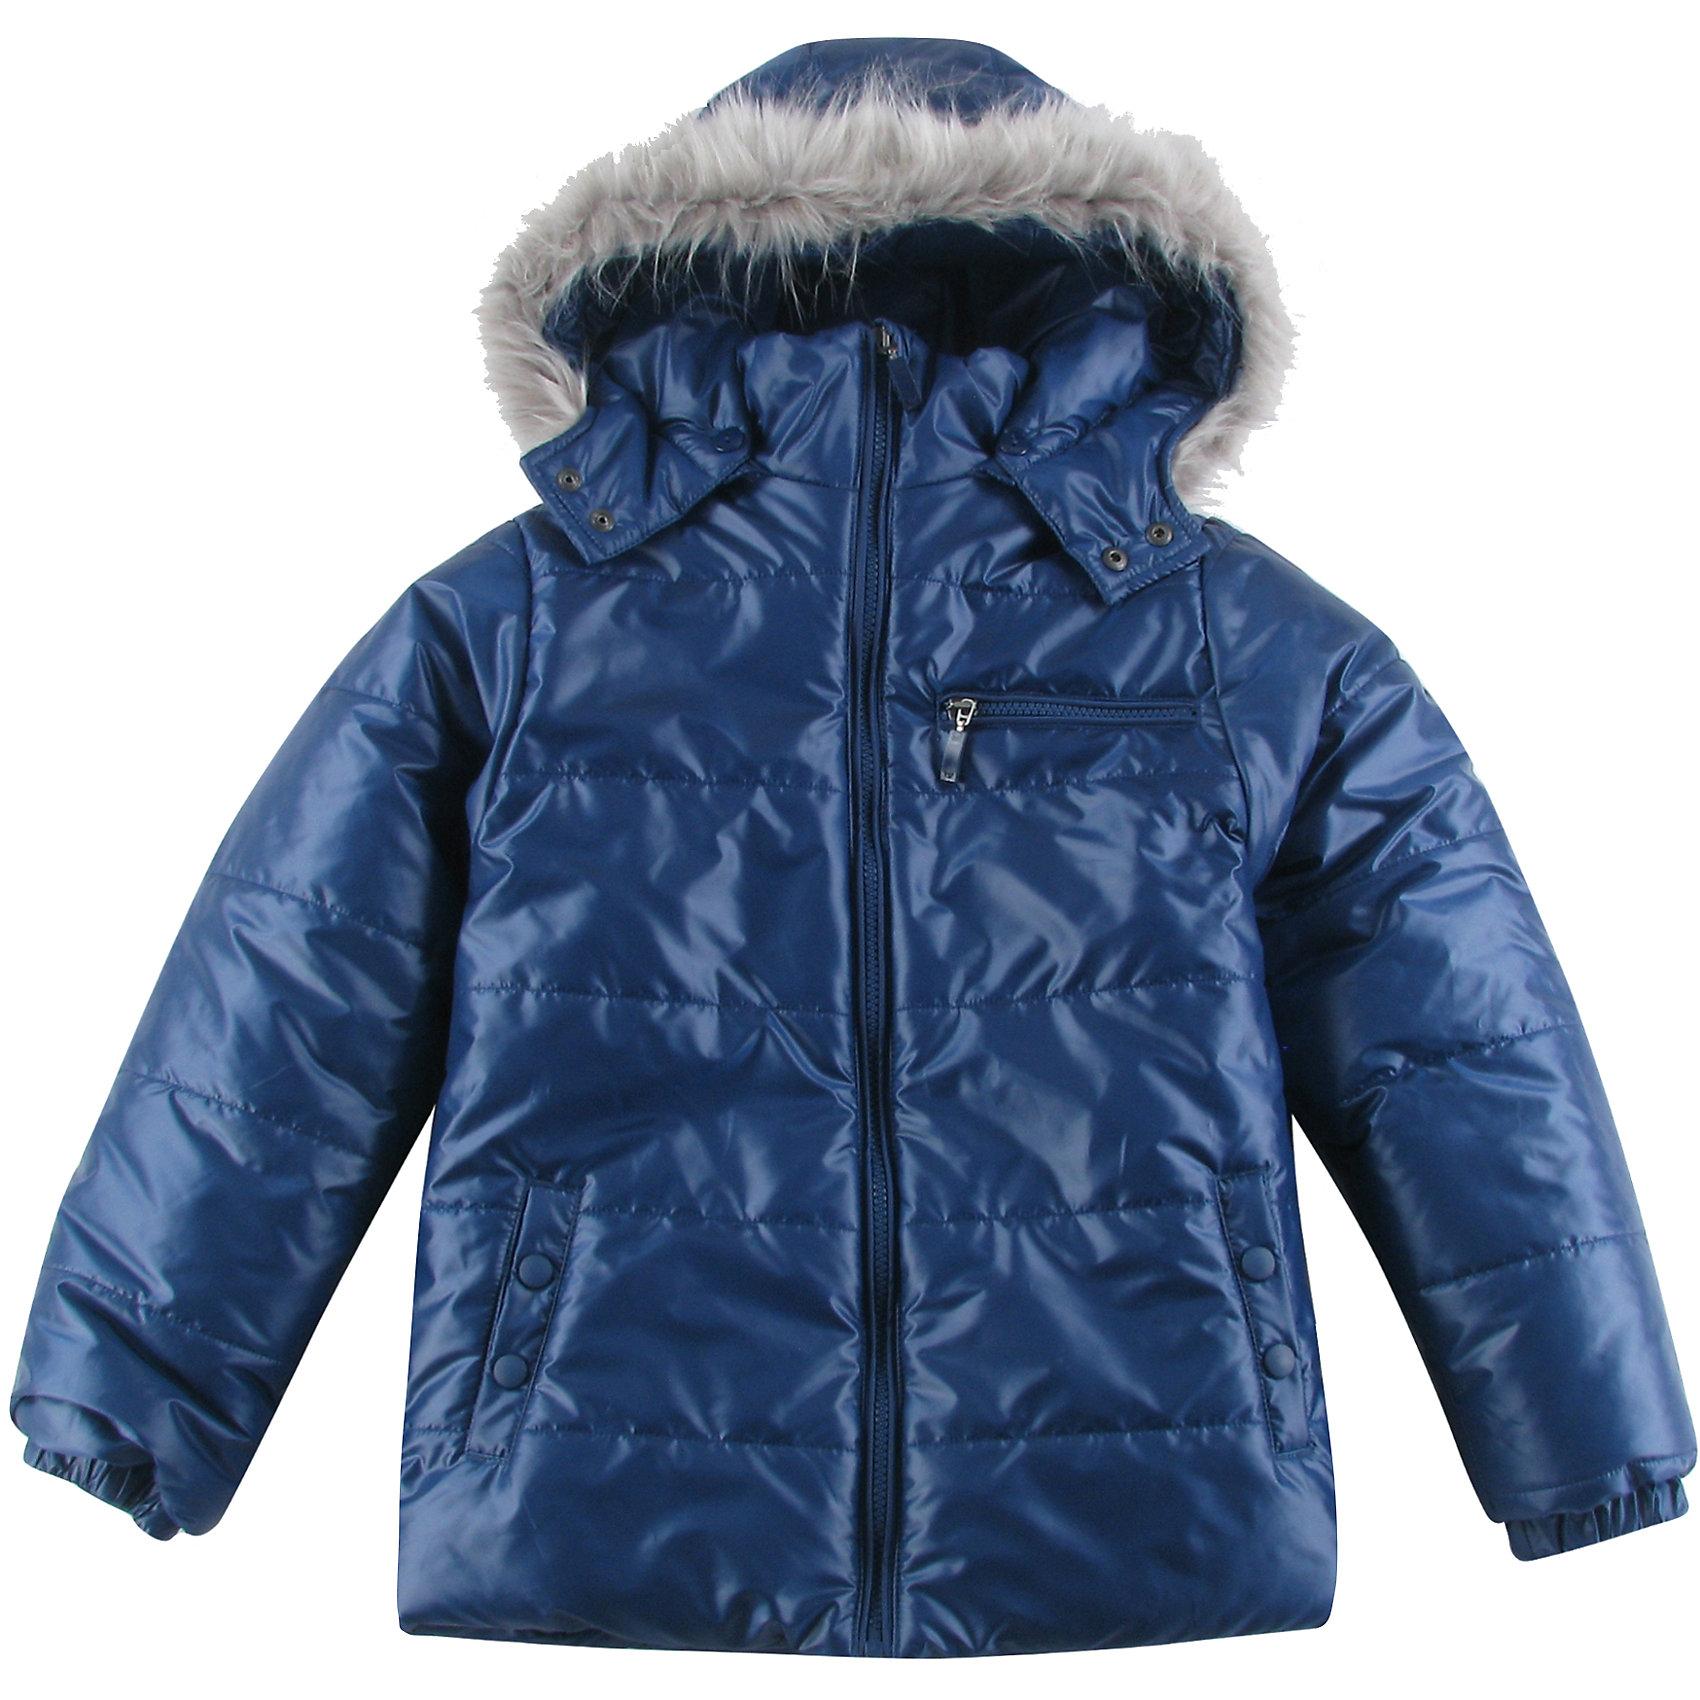 Куртка утепленная для мальчика WojcikВерхняя одежда<br>Куртка утепленная для мальчика Wojcik<br>Состав:<br>Полиэстер 100%<br><br>Ширина мм: 356<br>Глубина мм: 10<br>Высота мм: 245<br>Вес г: 519<br>Цвет: темно-синий<br>Возраст от месяцев: 144<br>Возраст до месяцев: 156<br>Пол: Мужской<br>Возраст: Детский<br>Размер: 128,134,140,146,152,158<br>SKU: 5592229